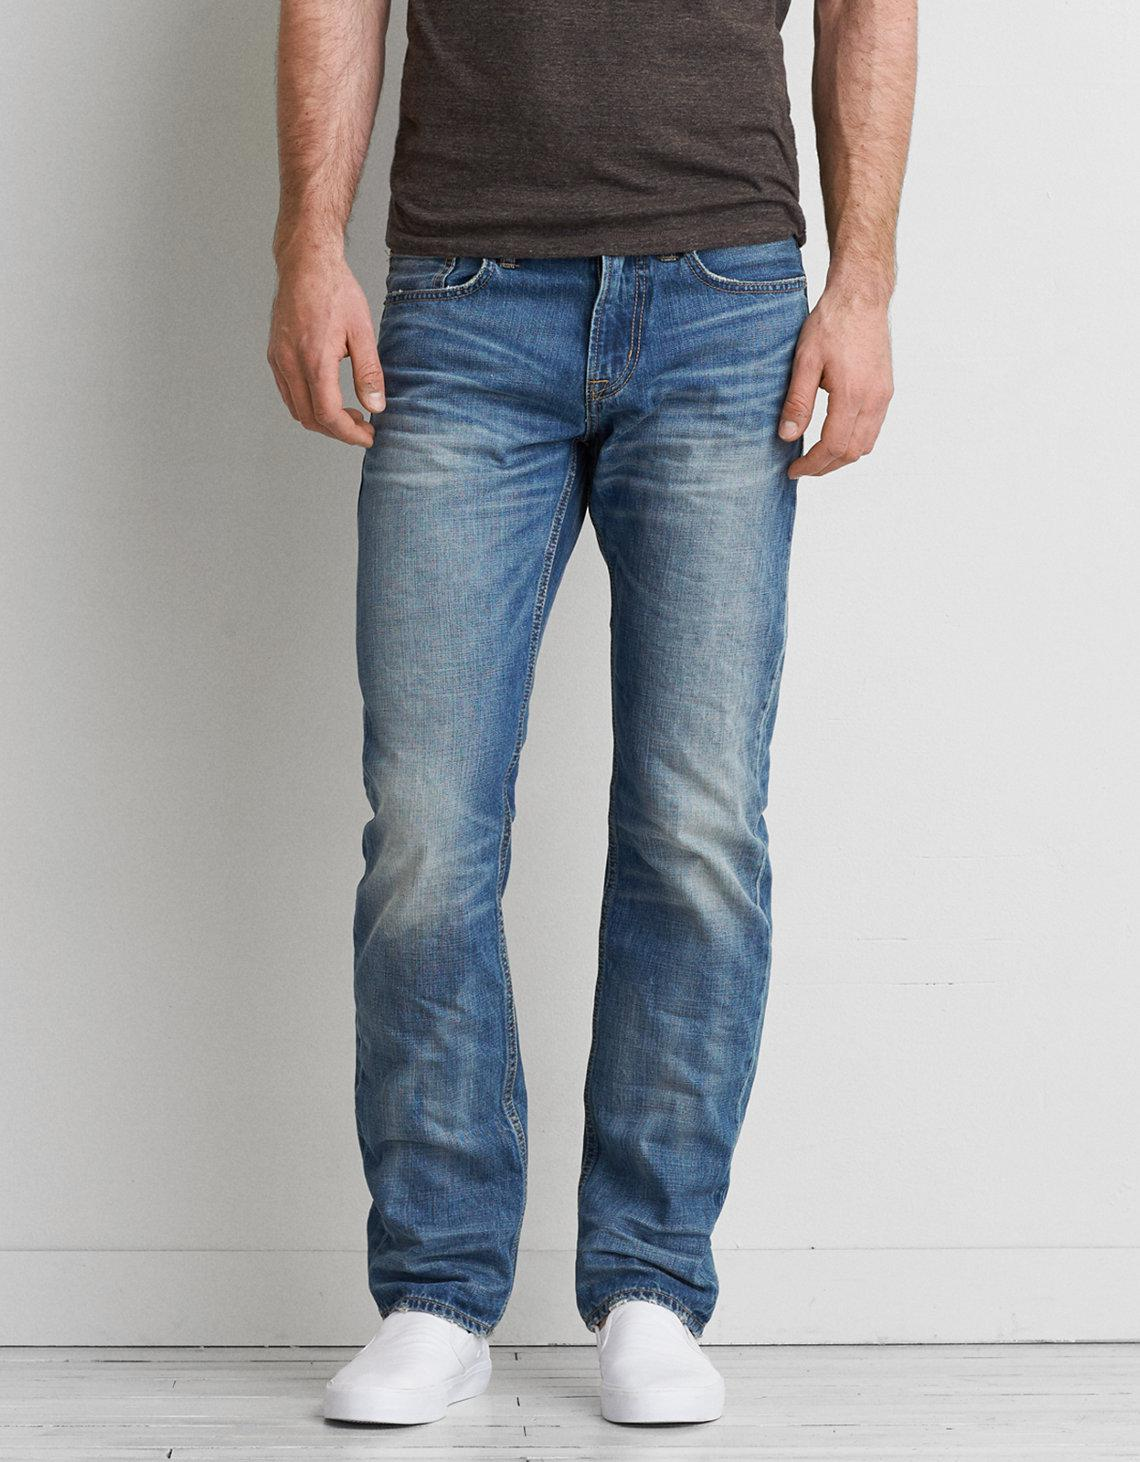 مضحك جدا قمة العنب American Eagle Slim Straight Jeans Musichallnewport Com